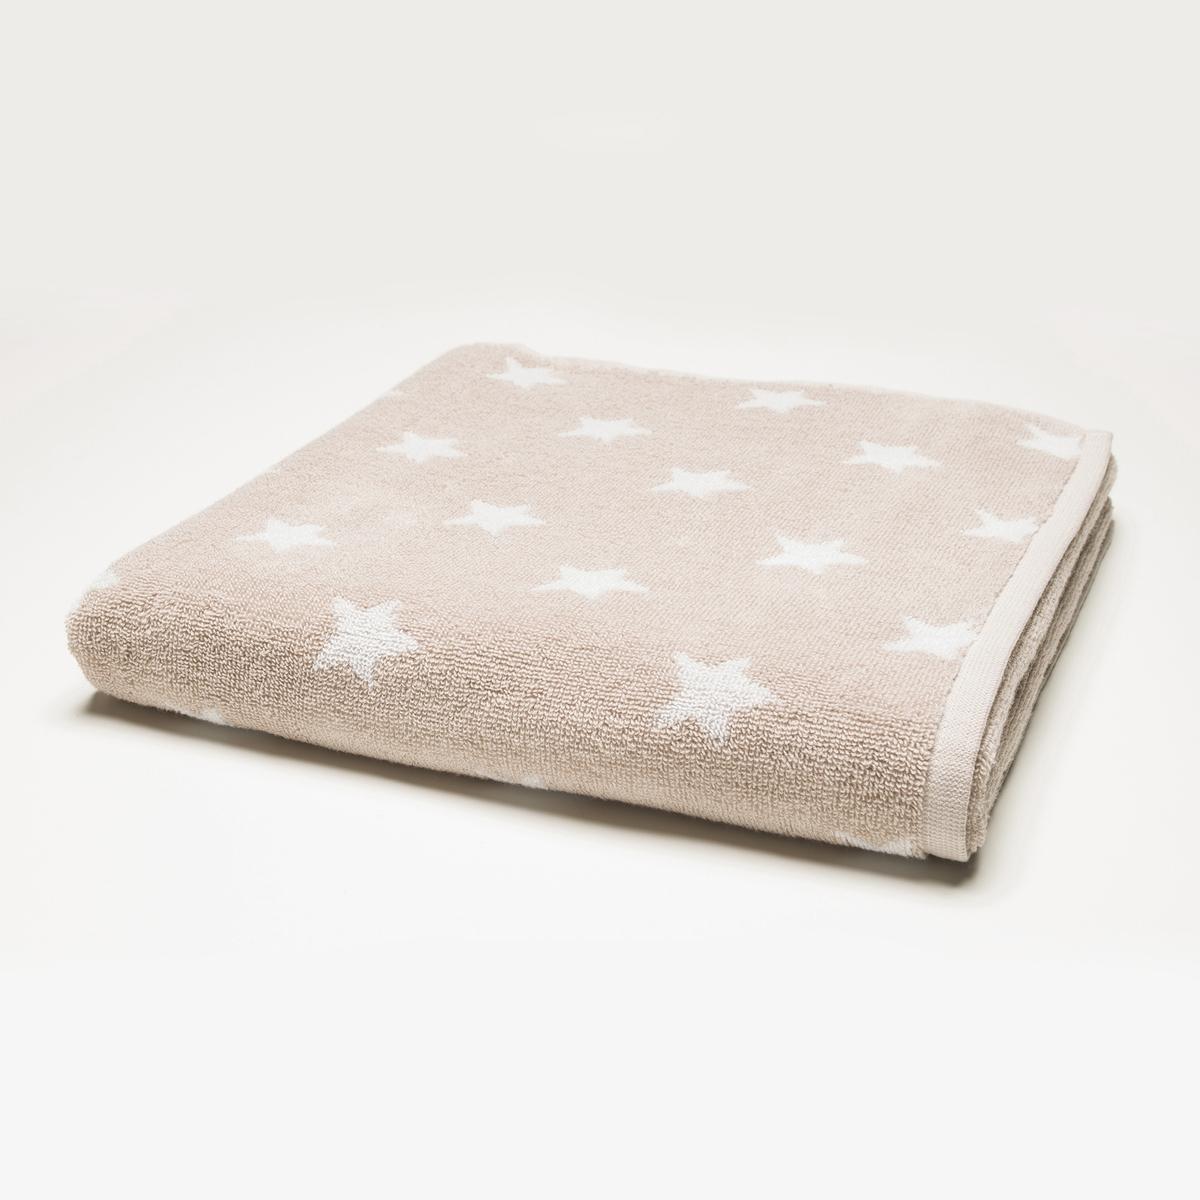 Полотенце банное Stars 100% хлопка . полотенца dream time банное вафельное полотенце волки